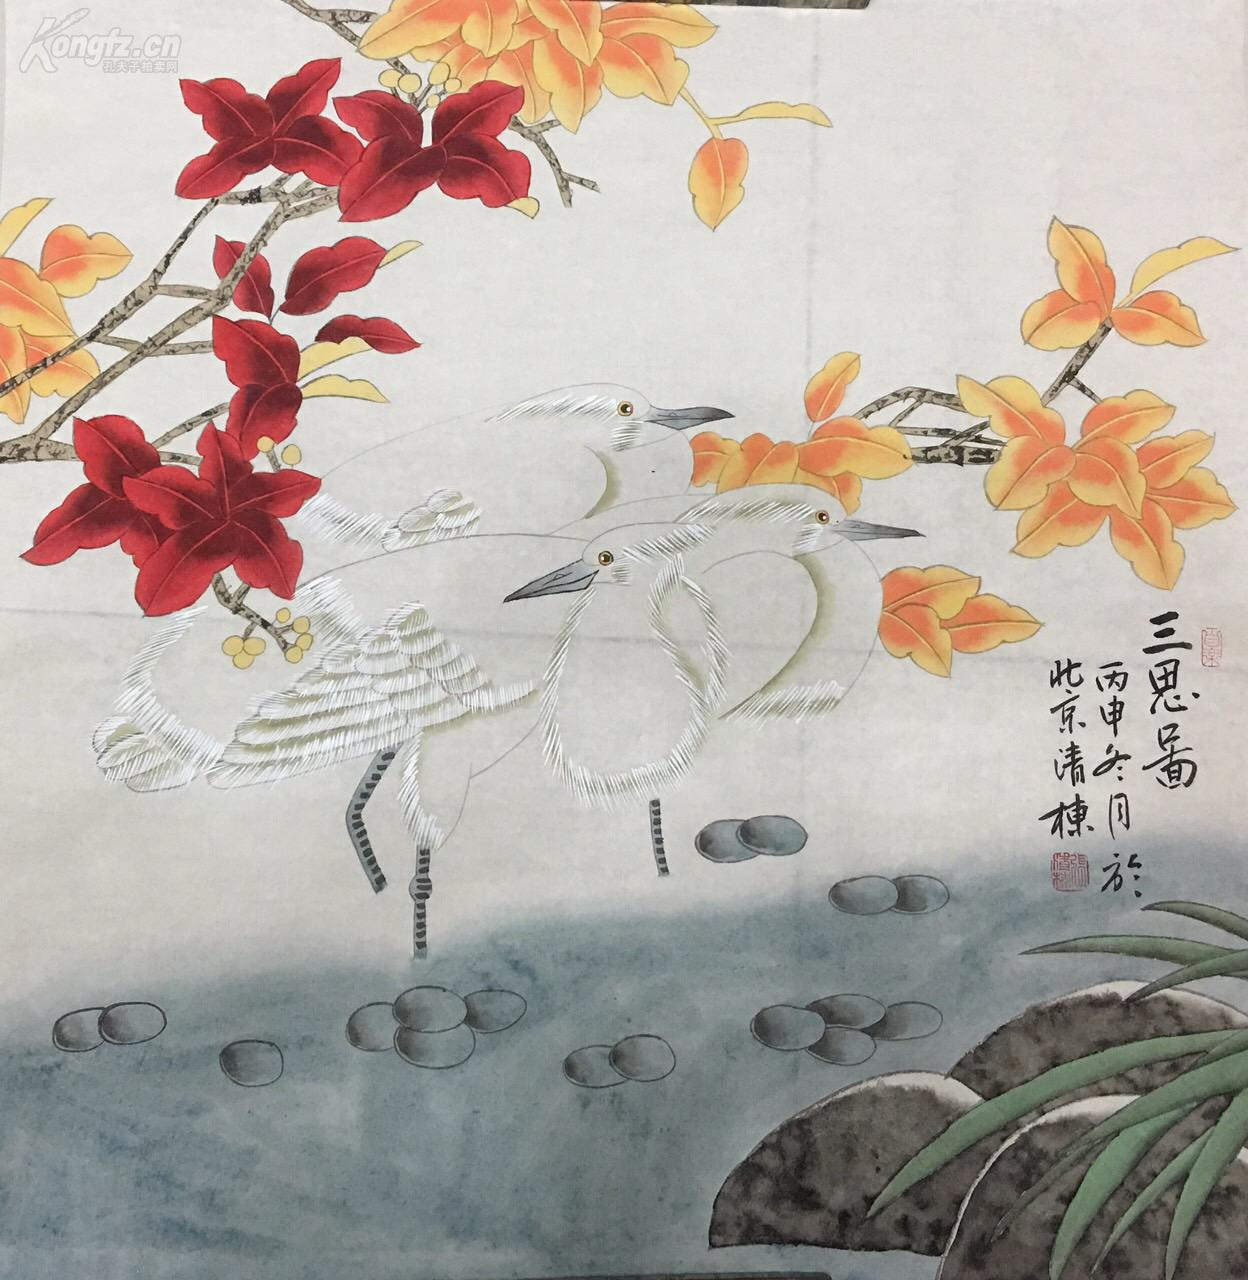 中国书画-zhongguoshuhua